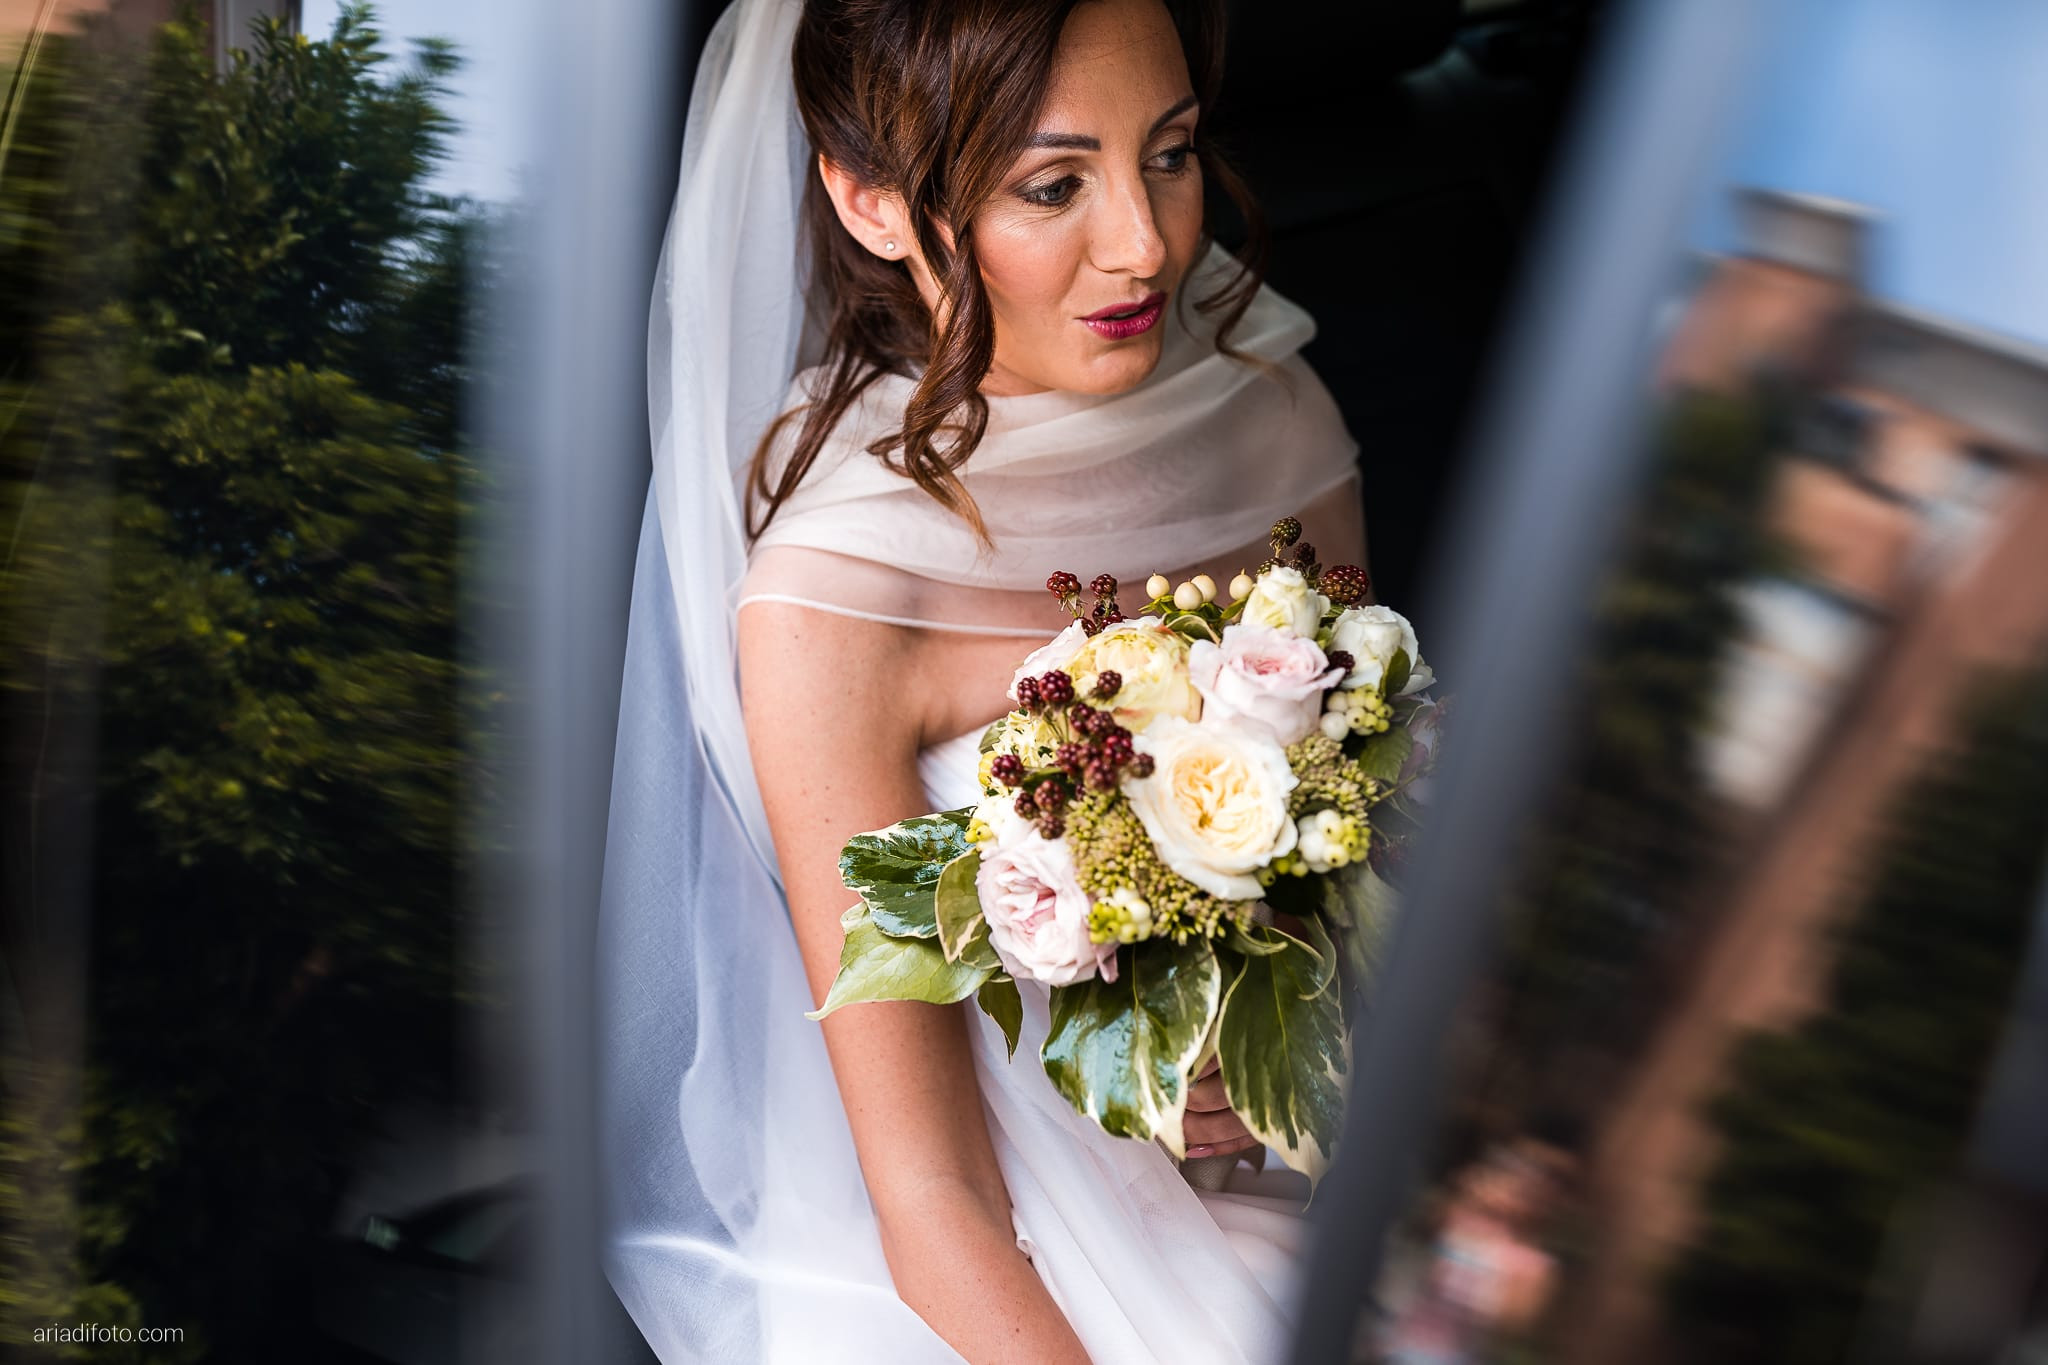 Stefania Raffaele Matrimonio Country Chic Outdoor Gorizia momenti